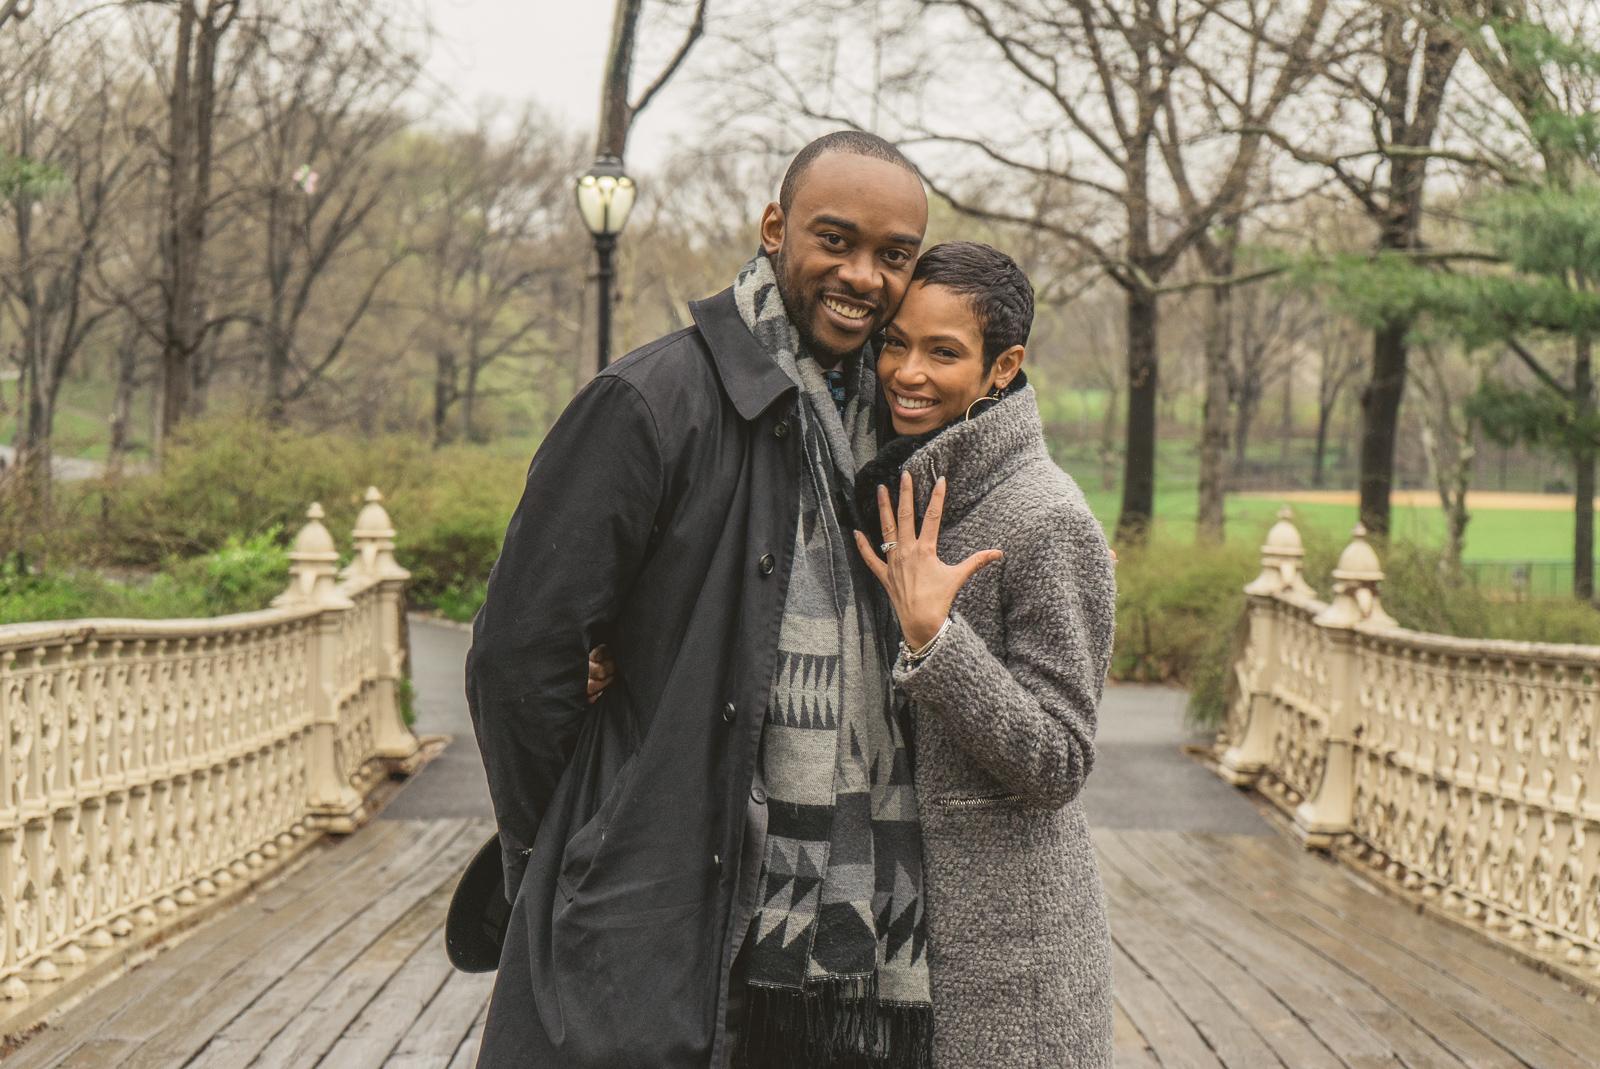 Photo 9 Pine Bank bridge Central Park Marriage Proposal   VladLeto